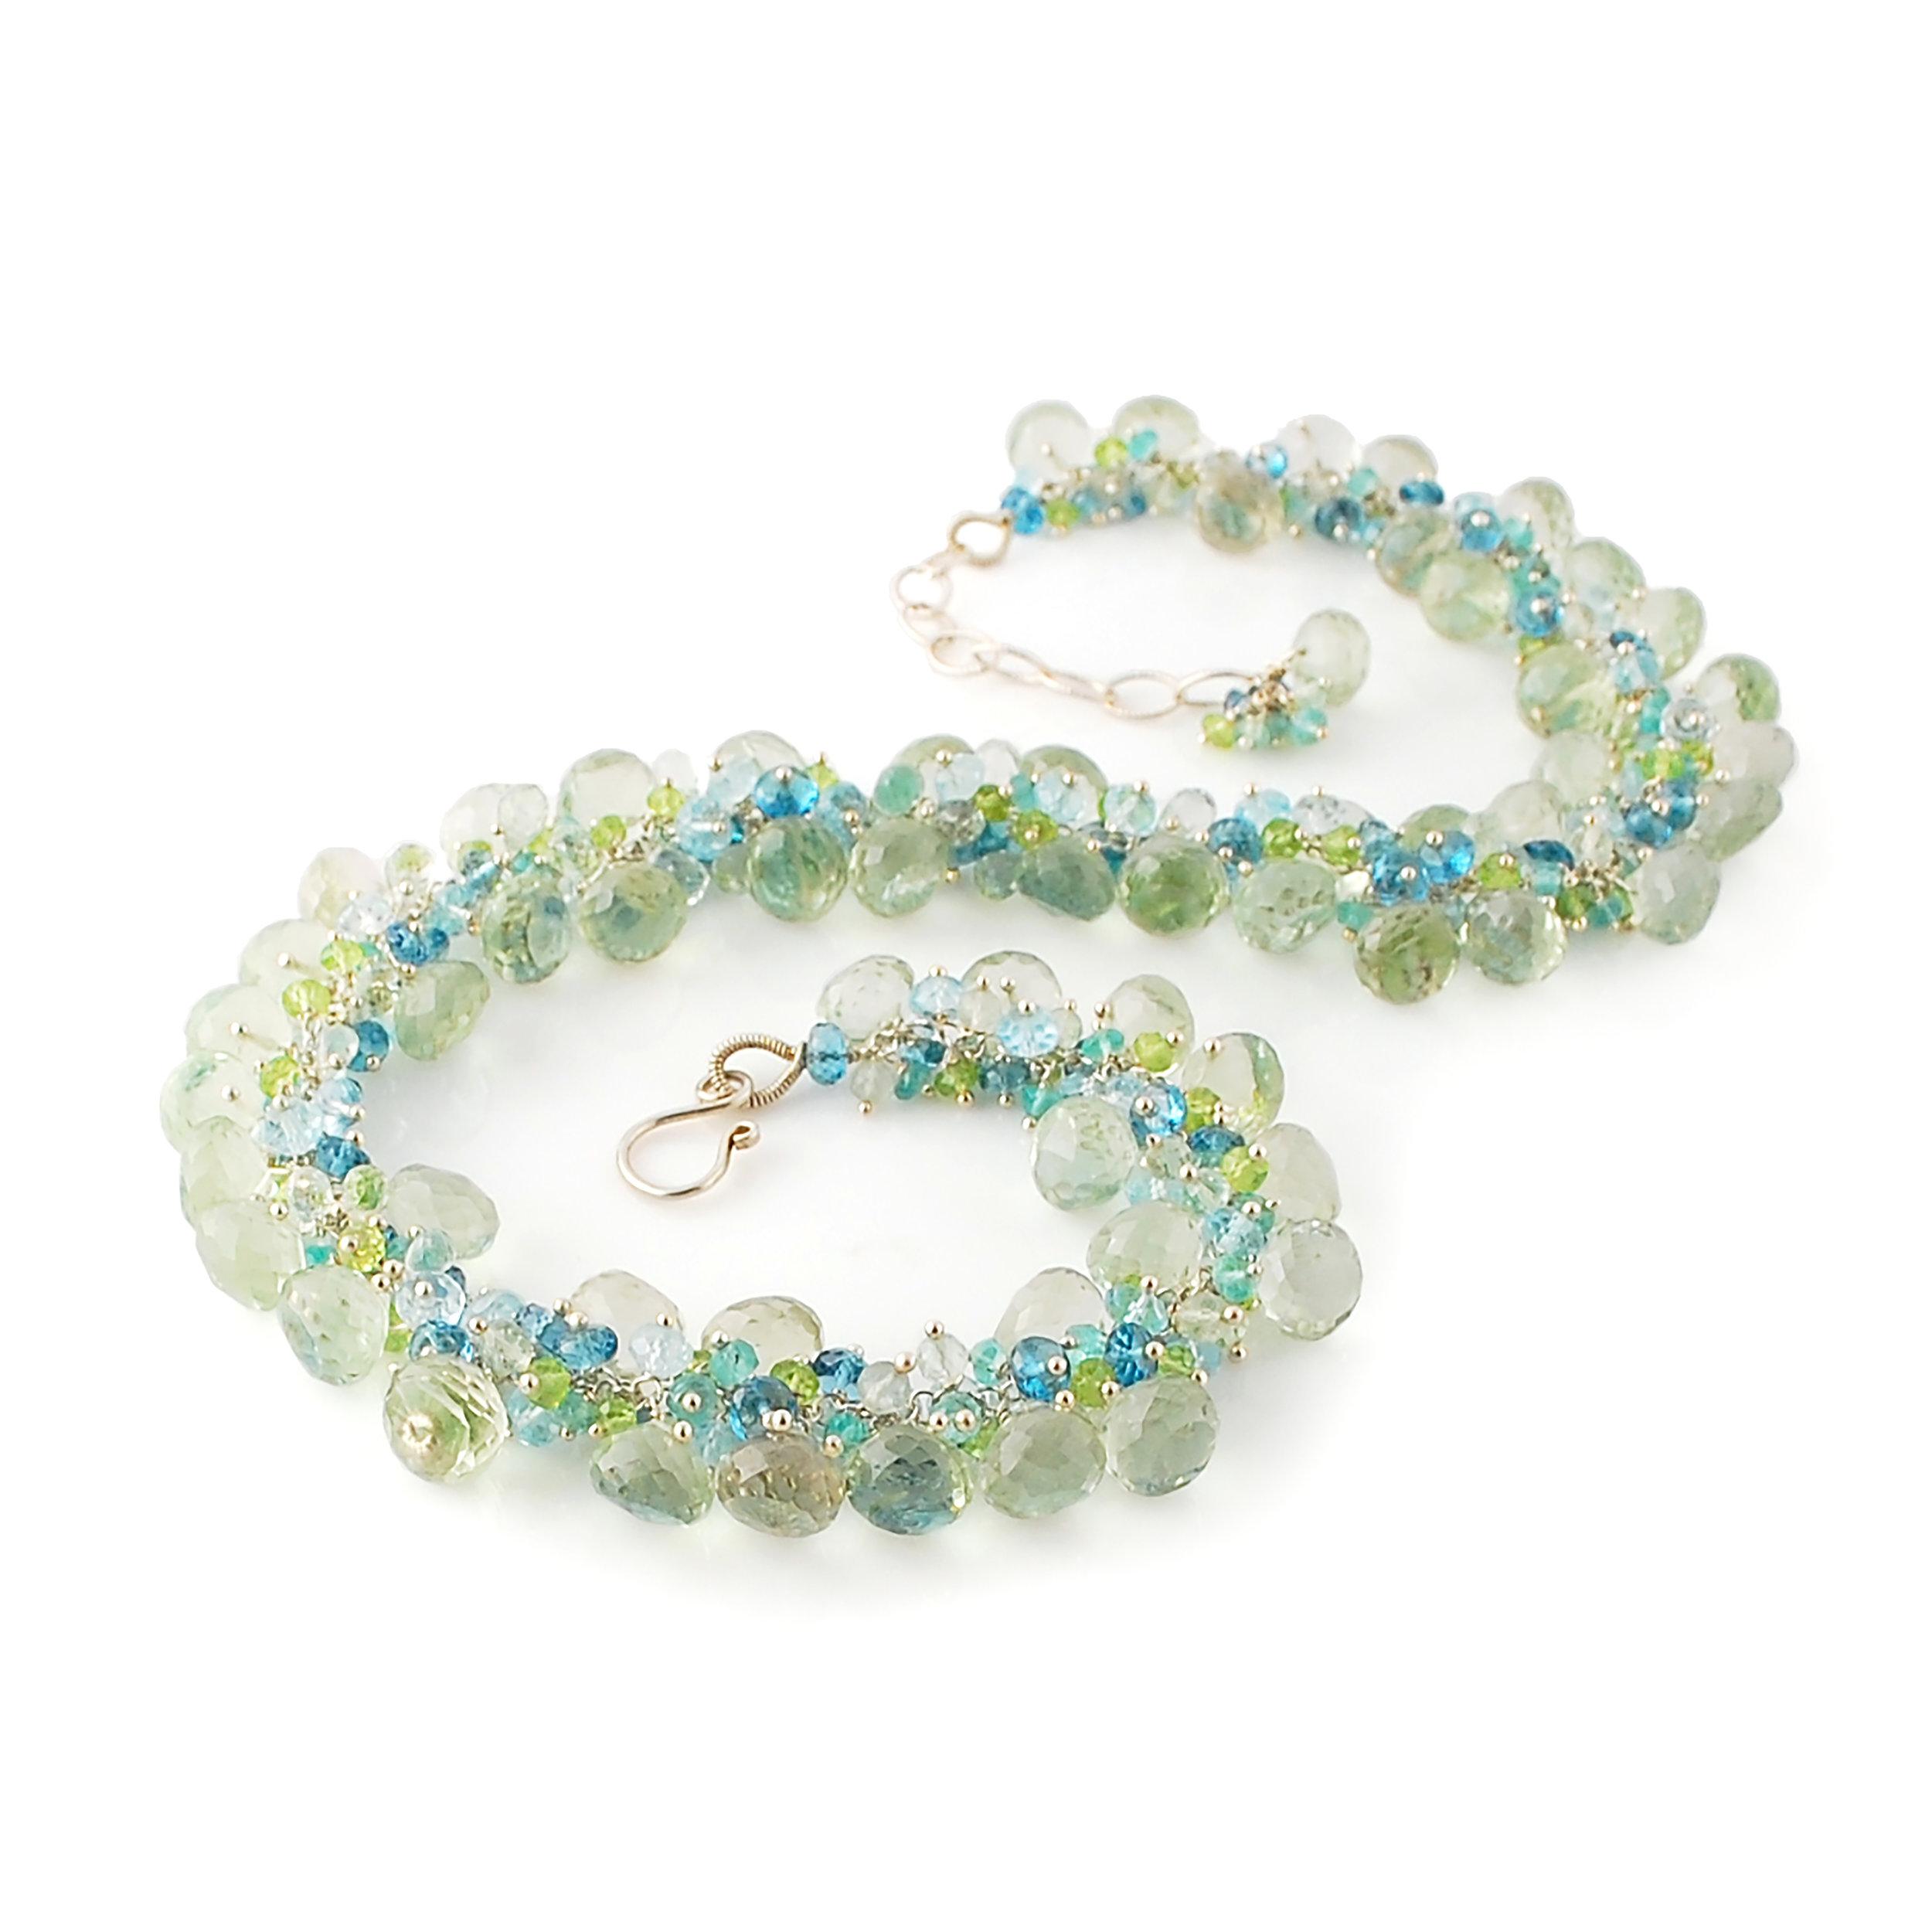 green-amethyst-blue-topaz-apatite-necklace-2.jpg